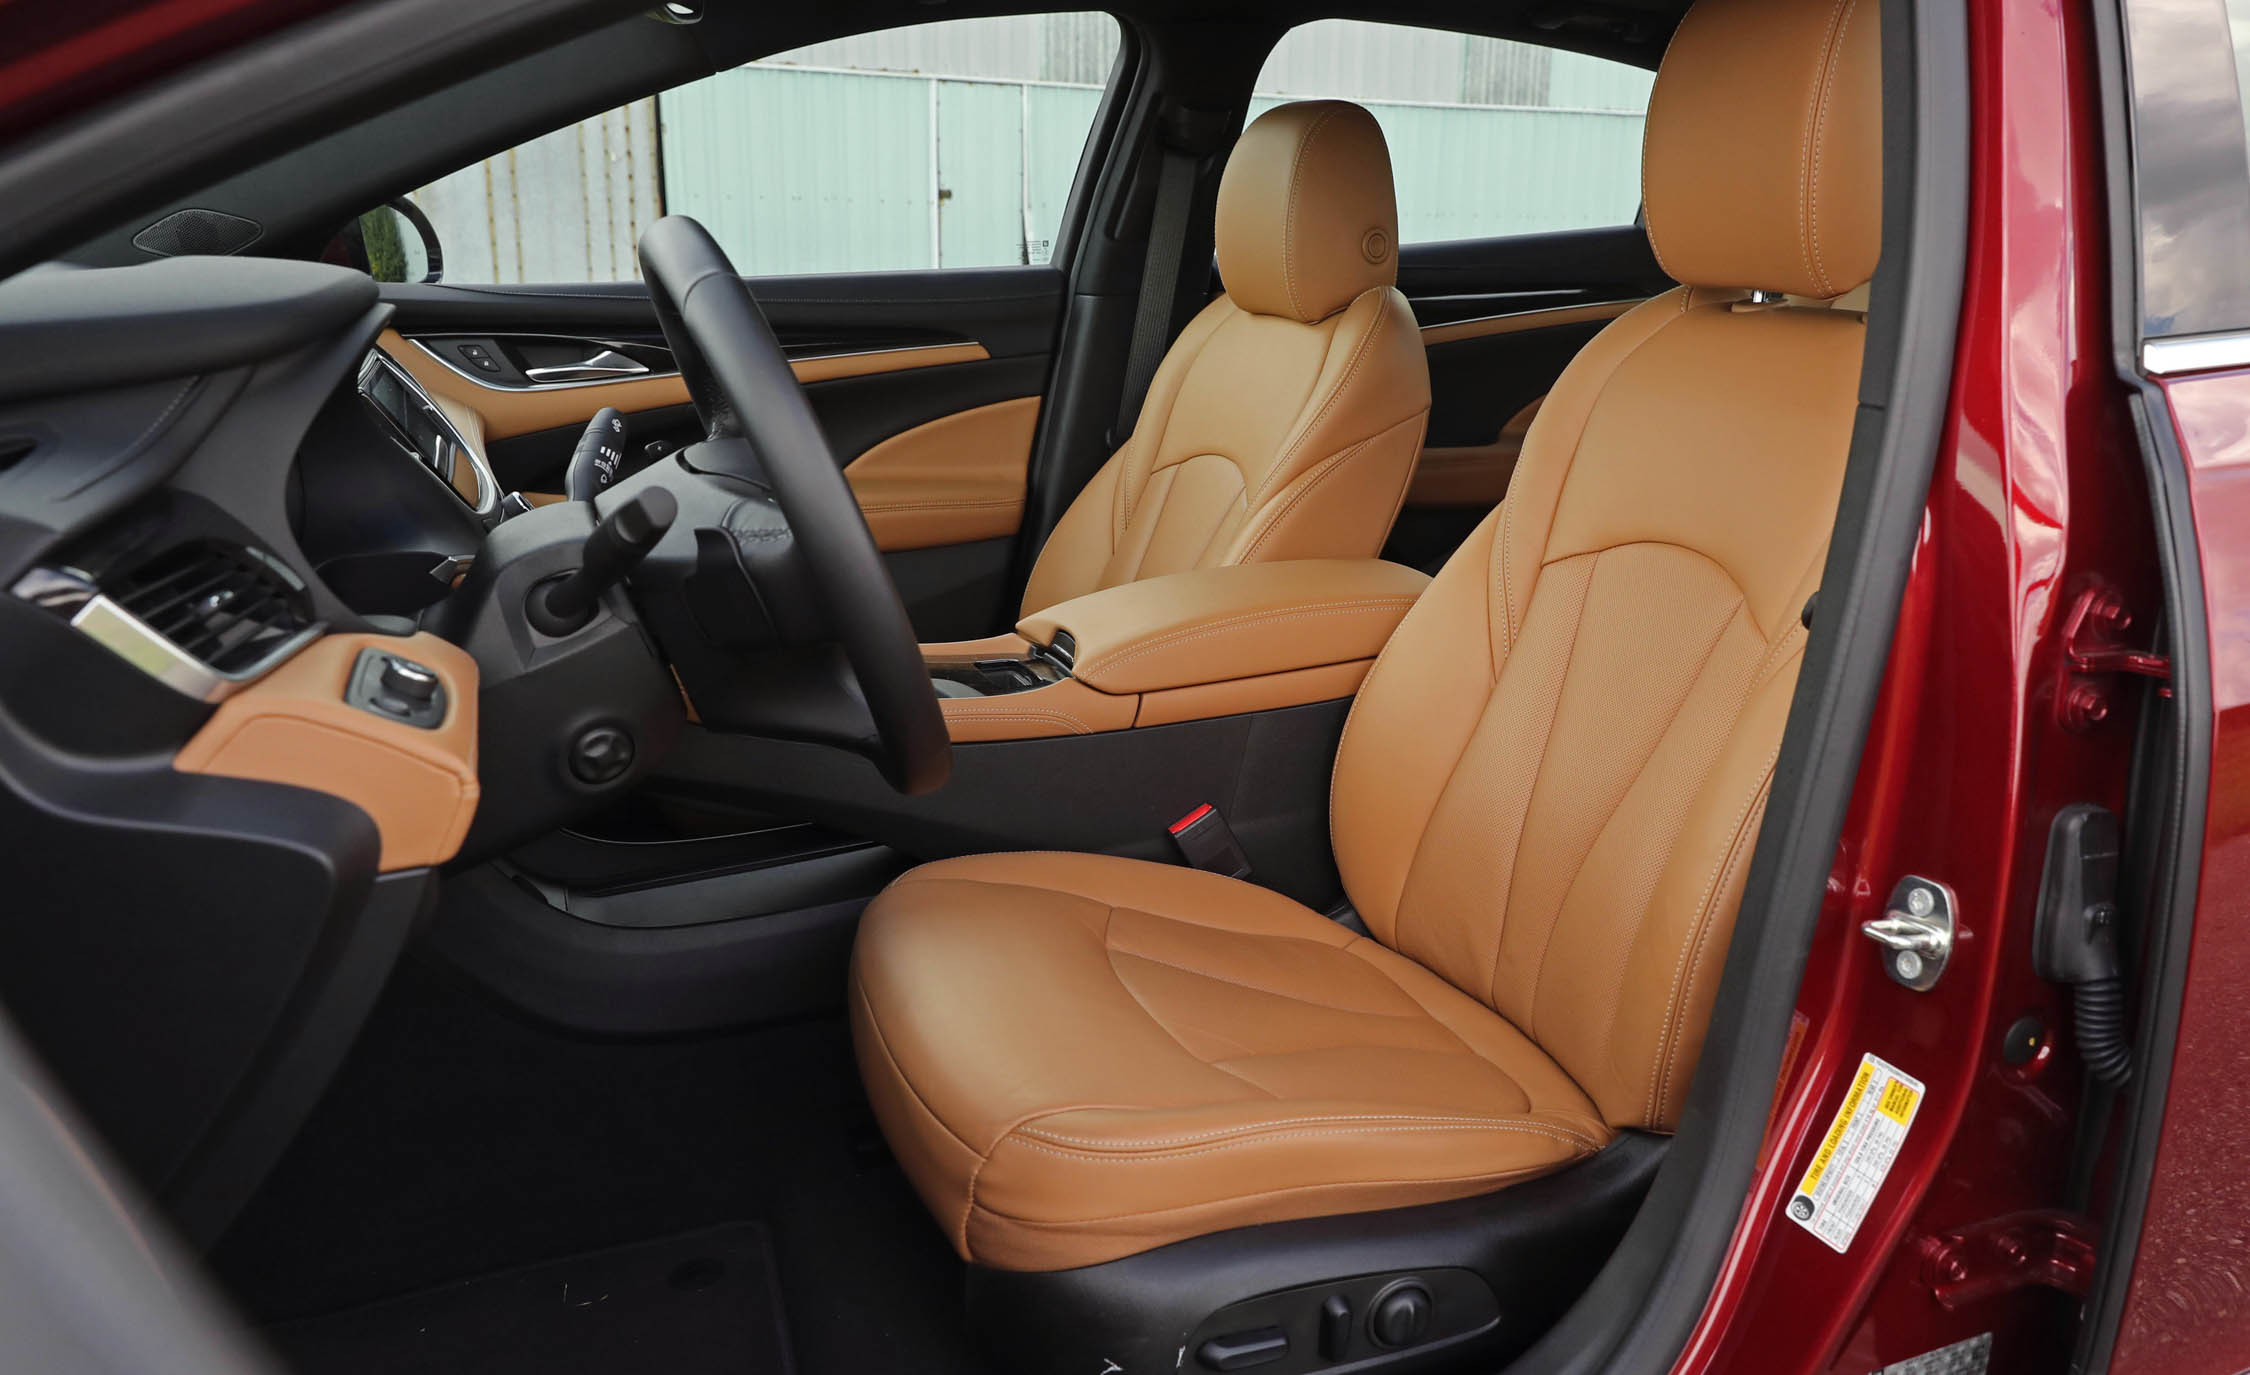 2017 Buick LaCrosse (Photo 6 of 26)